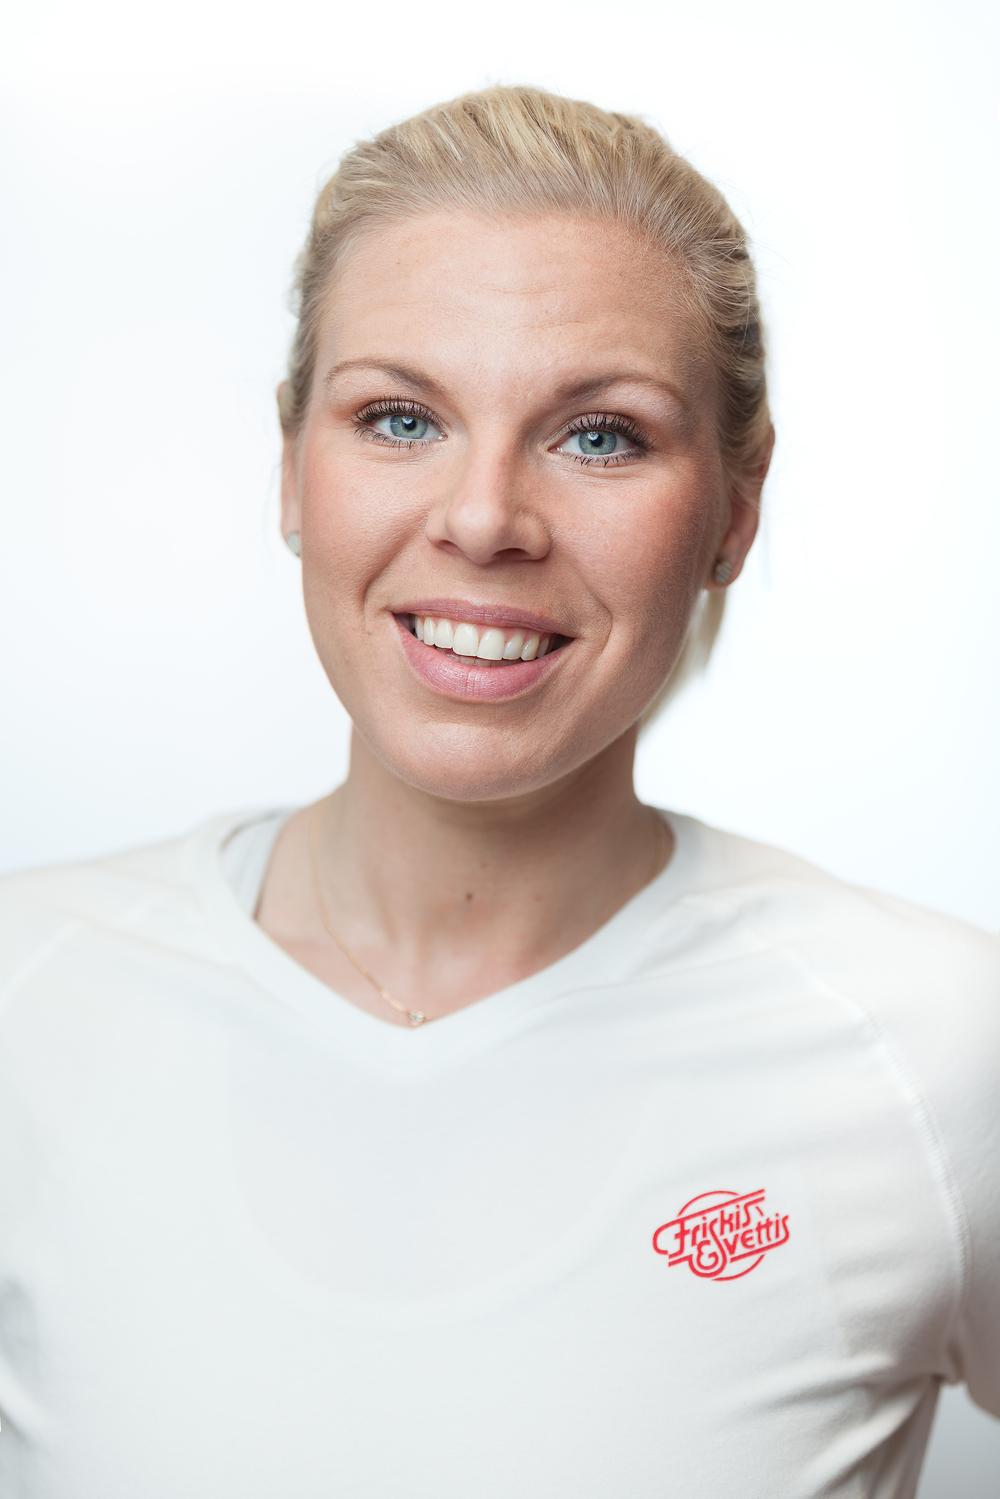 bild 4. Profilbild